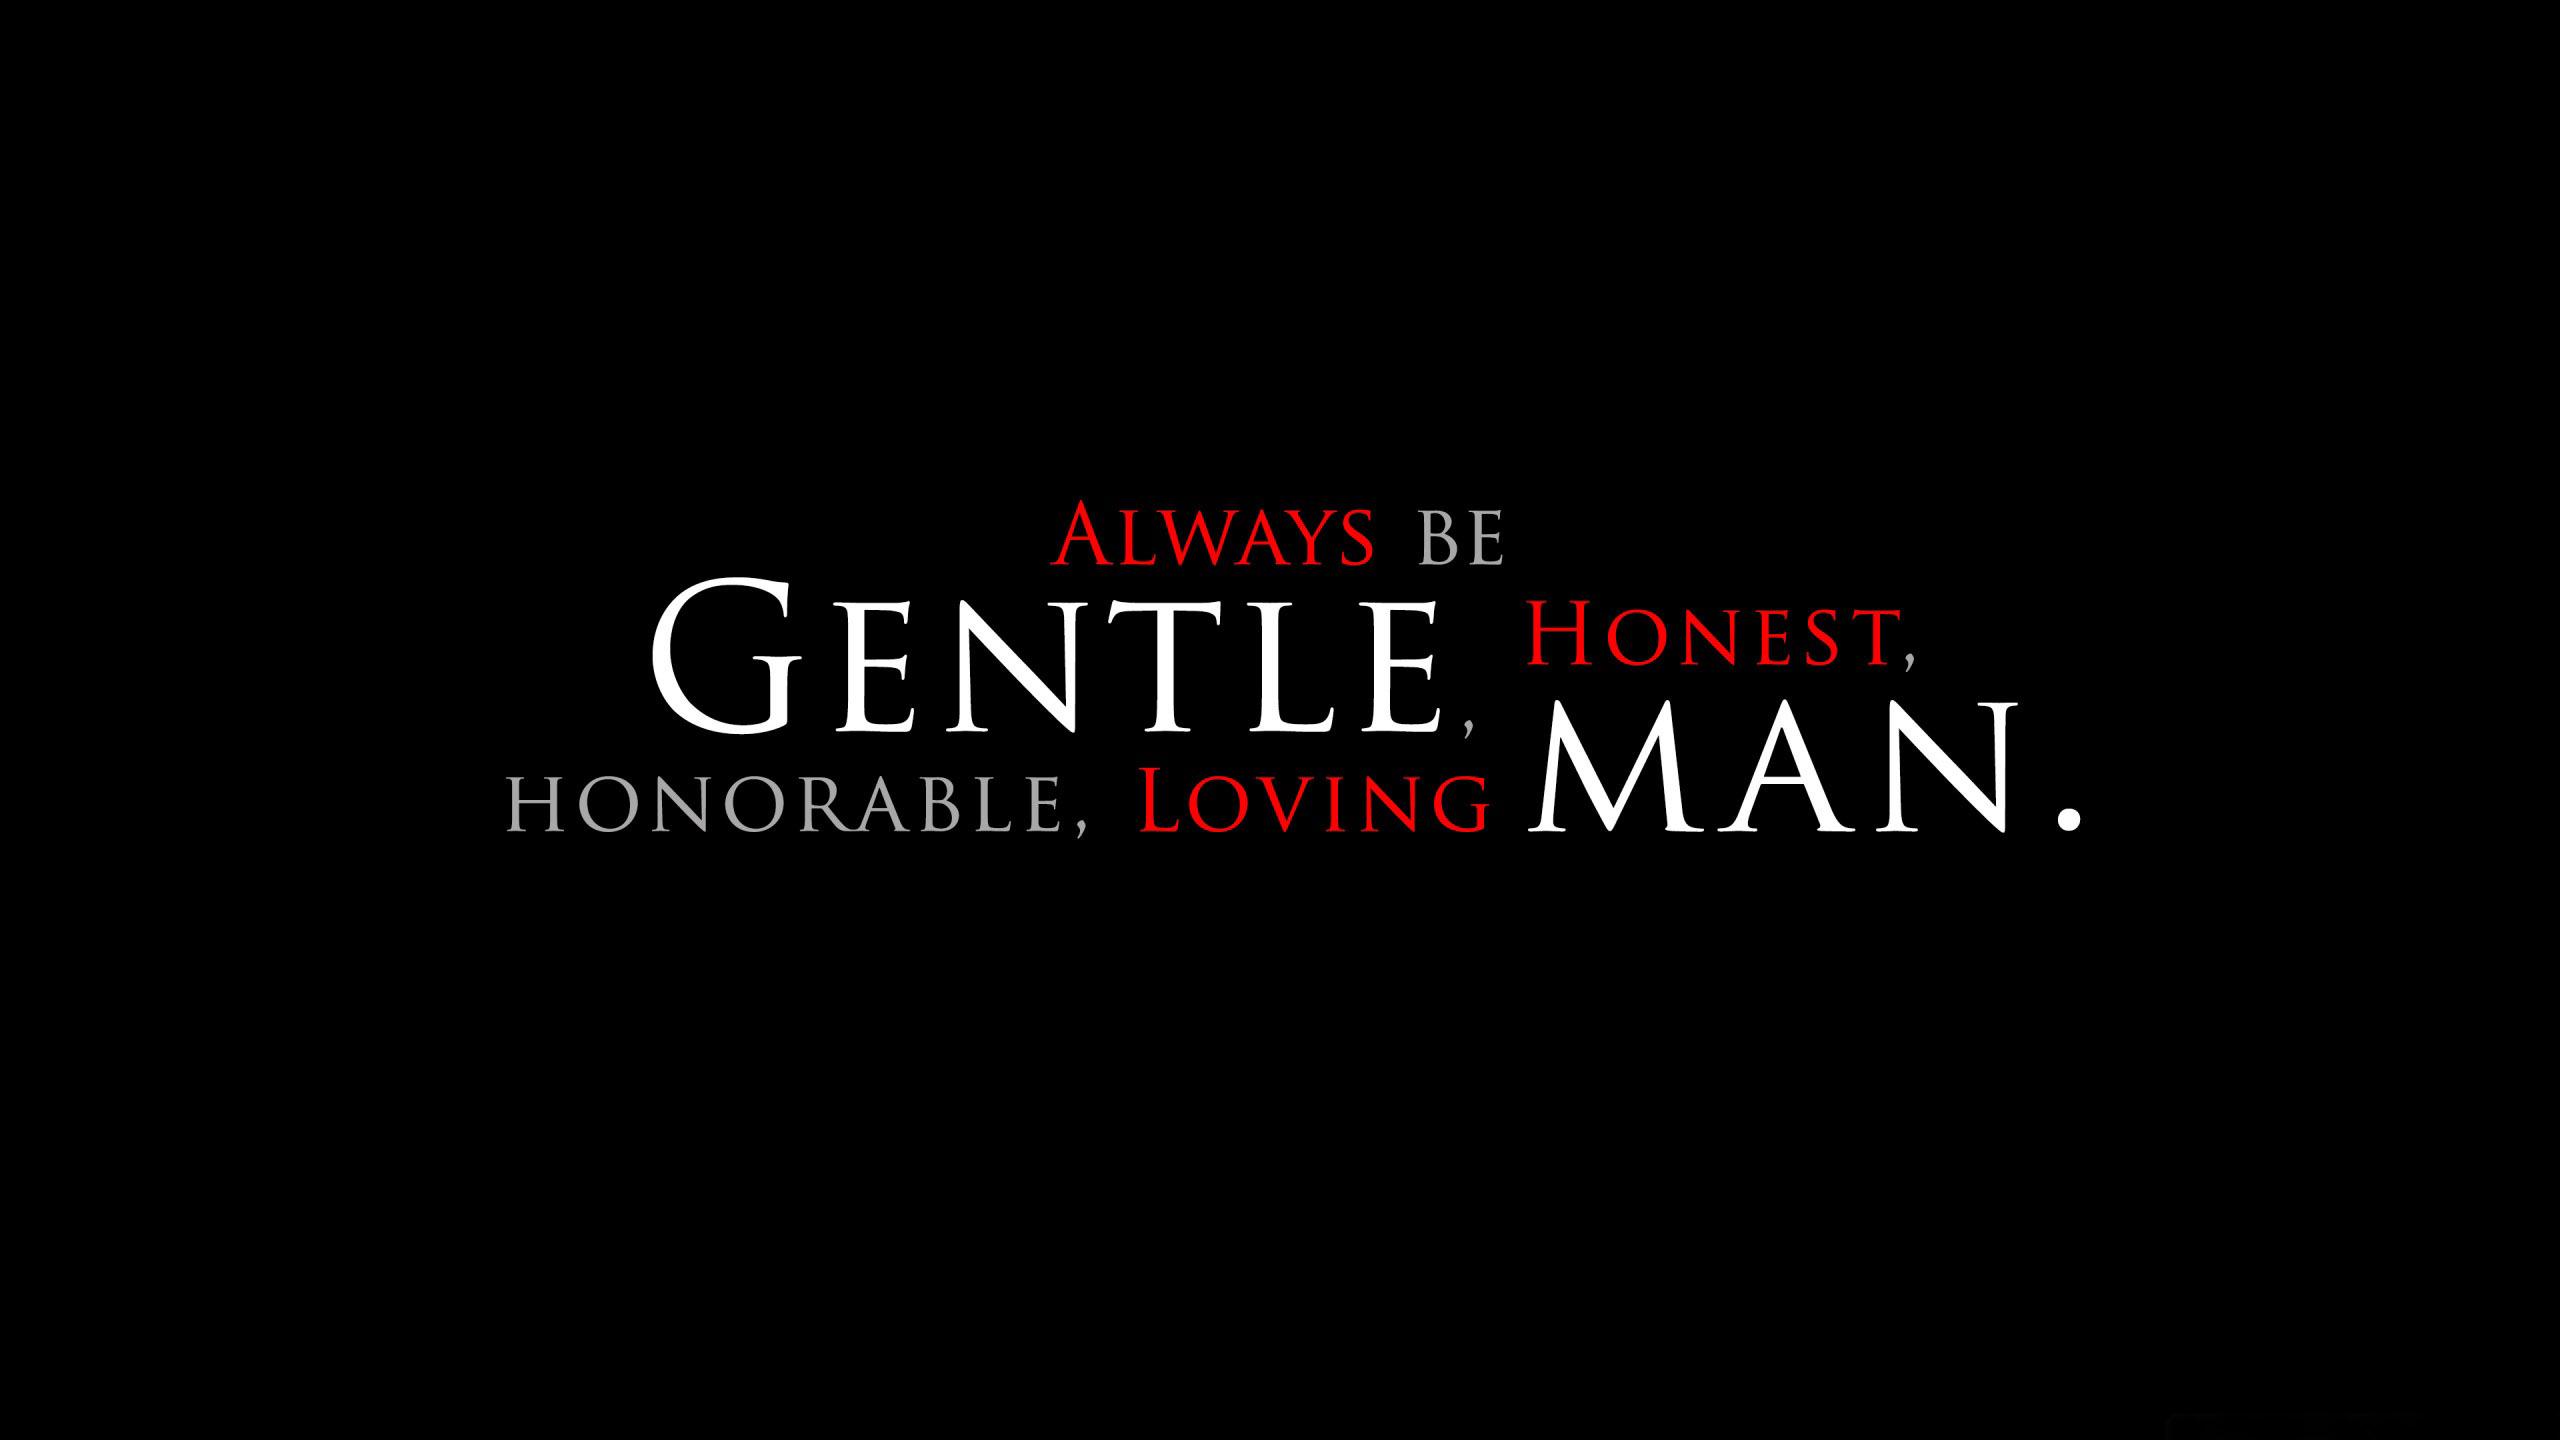 Be a good man wallpaper 33963 2560x1440